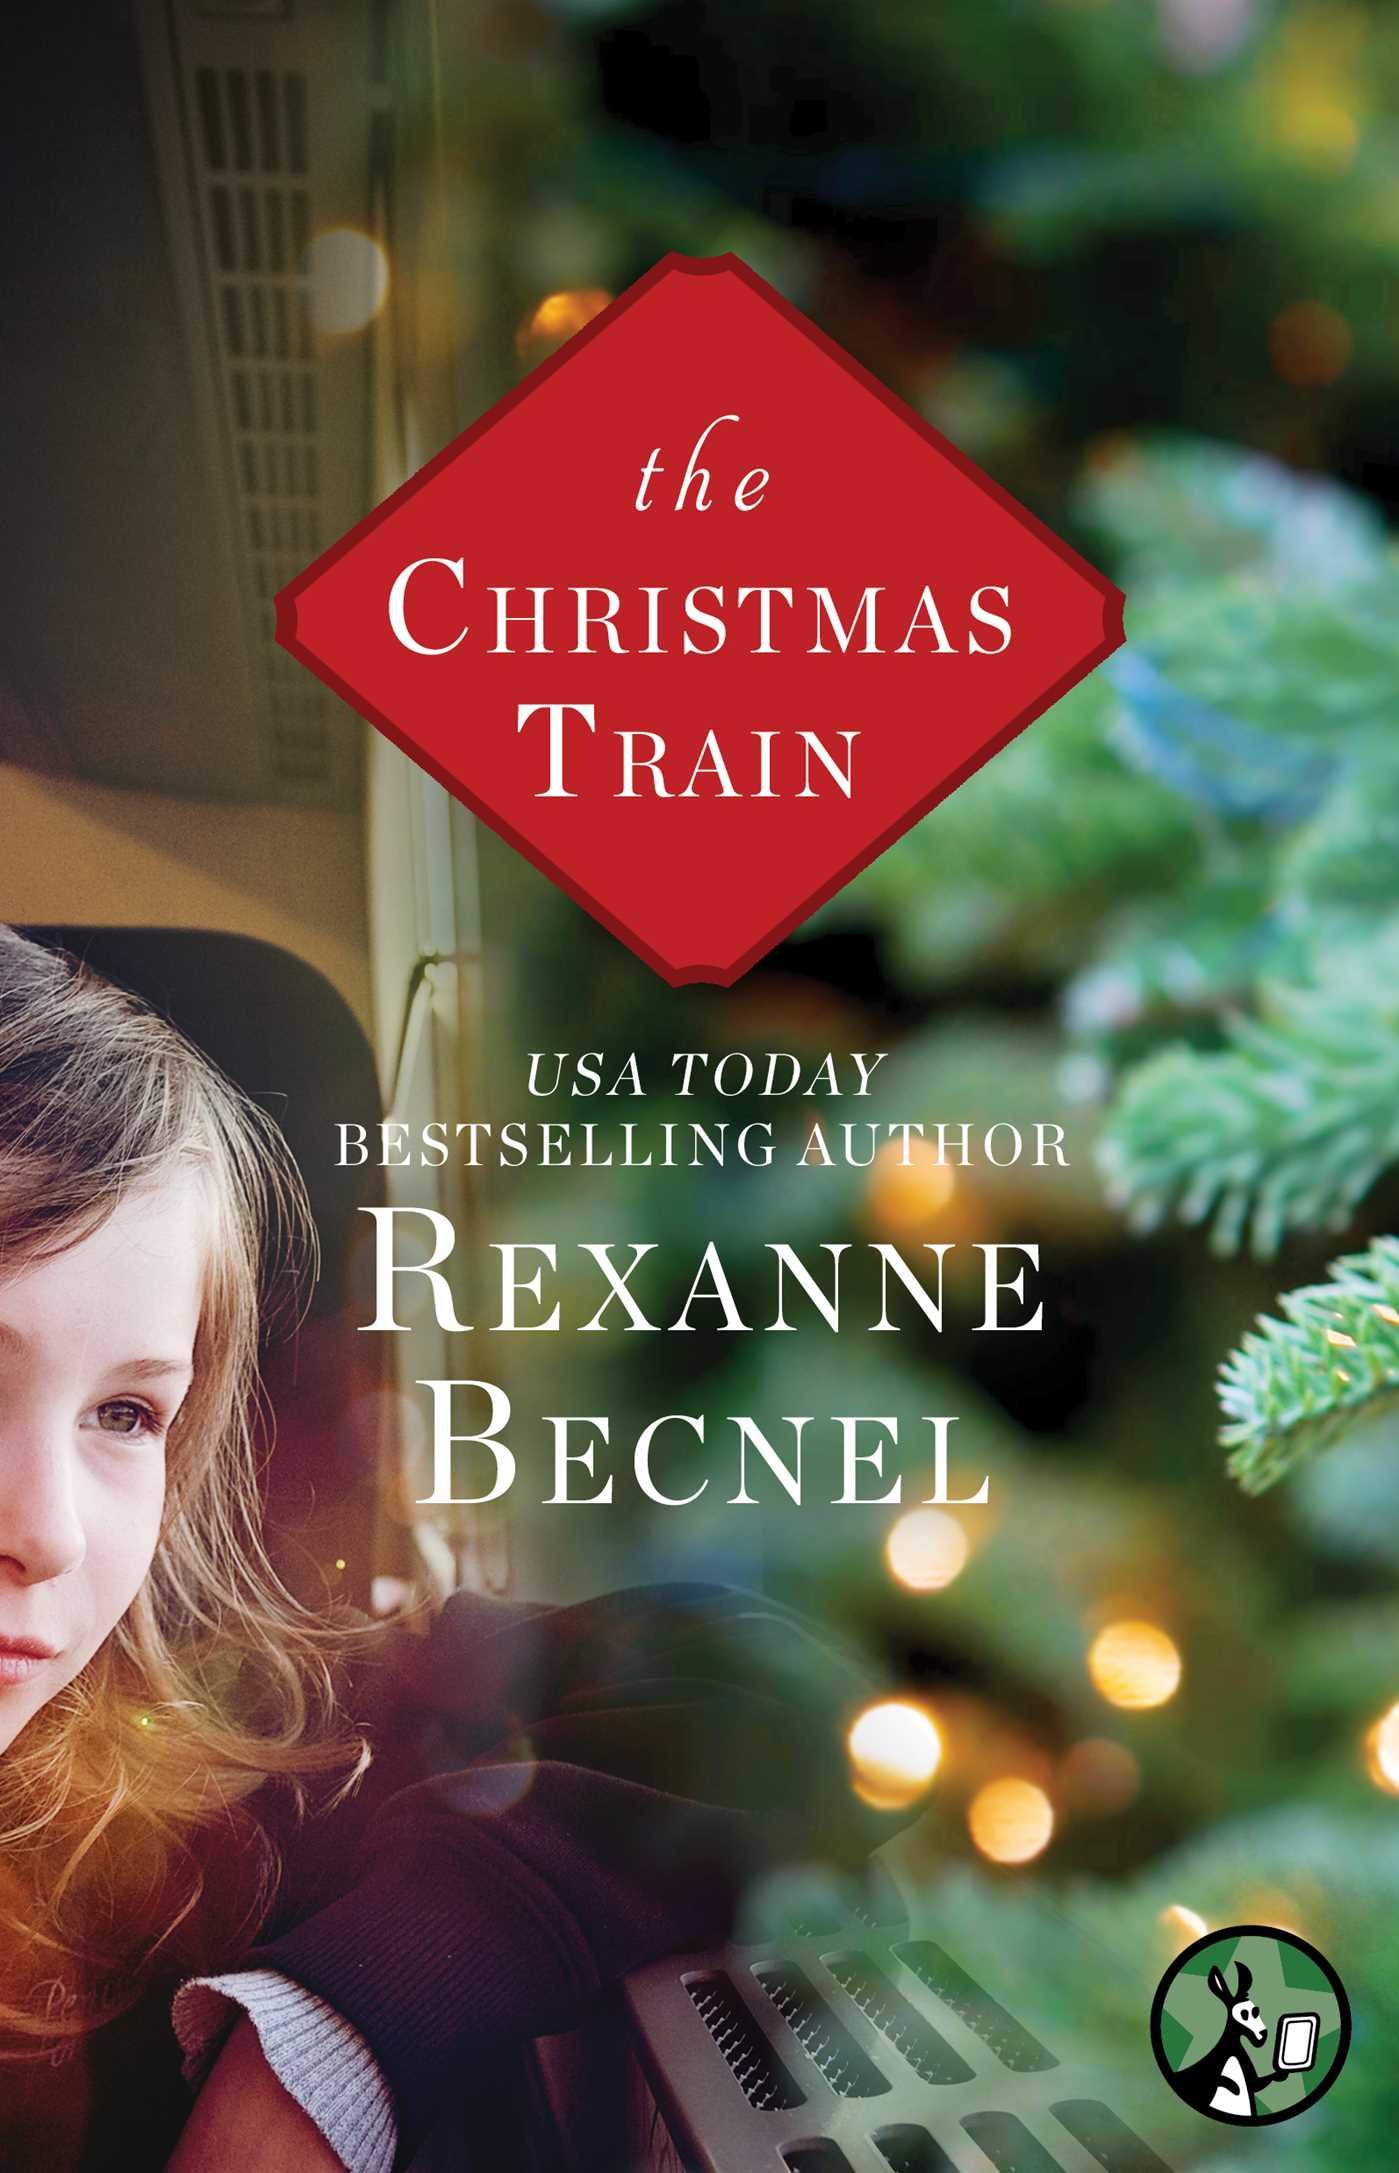 the christmas train 9781476779843 hr - The Christmas Train